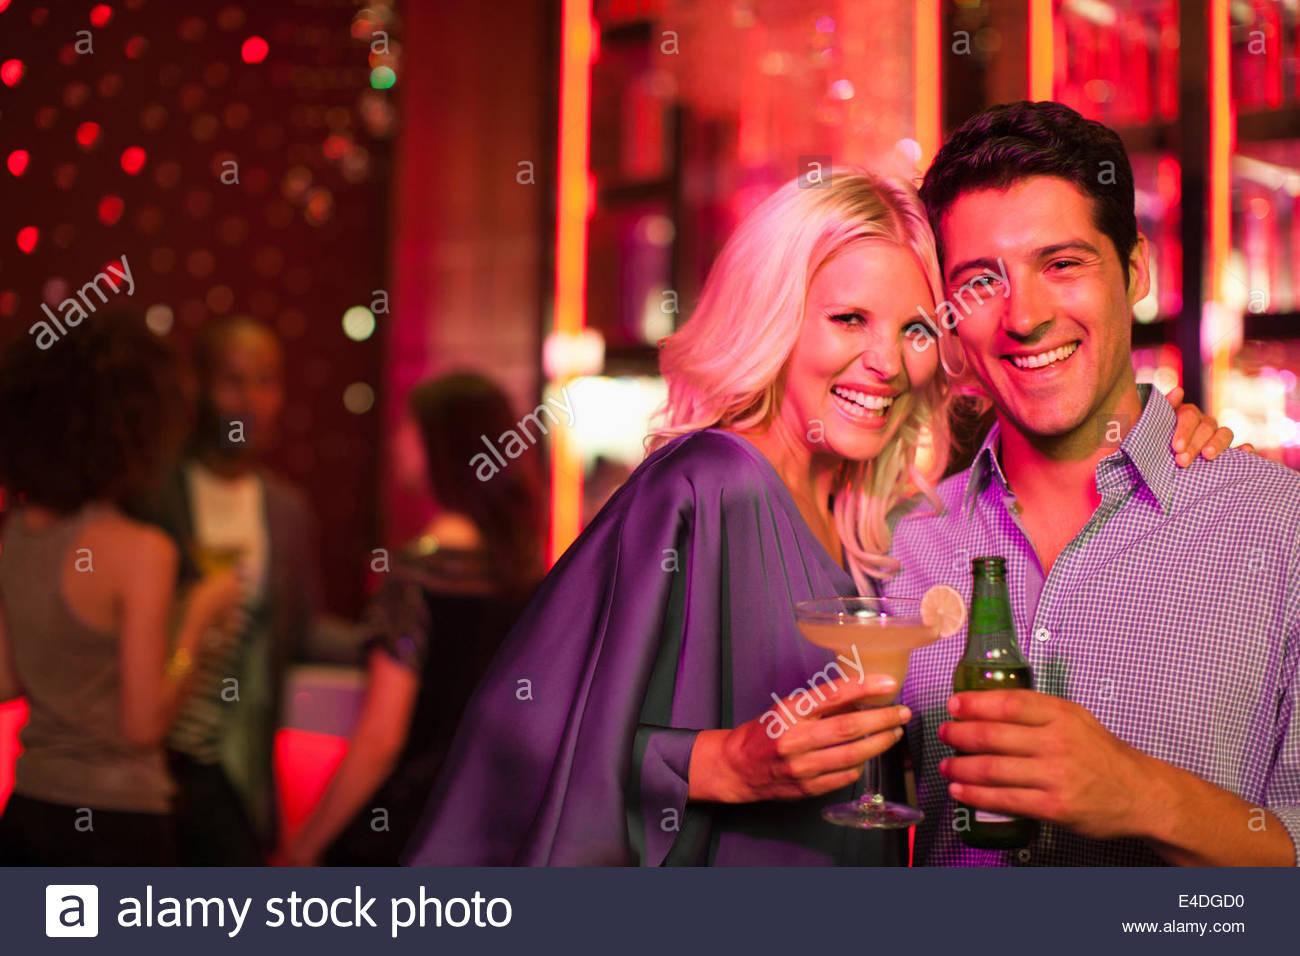 Couple holding drinks in nightclub - Stock Image